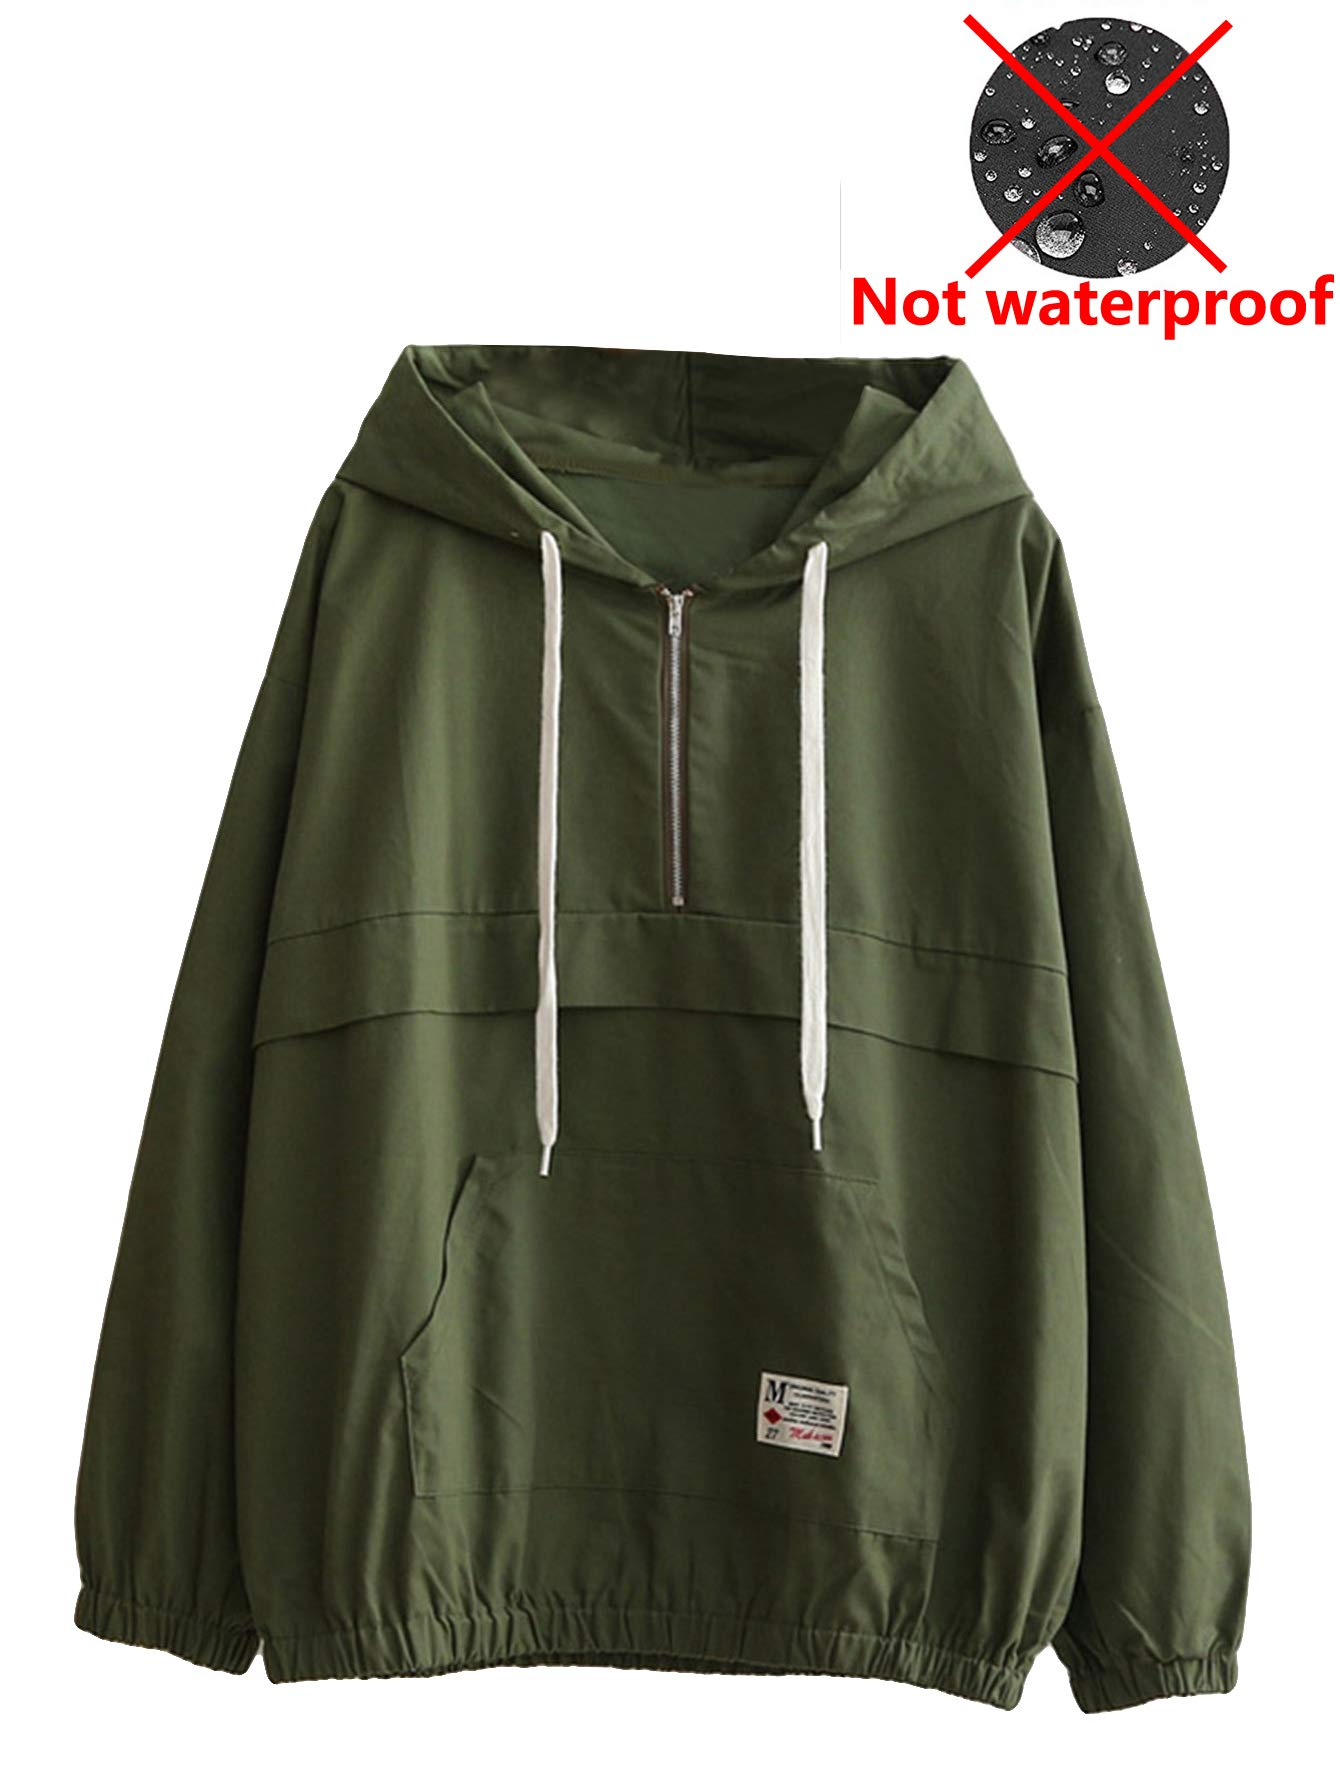 Romwe Women's Lightweight Kangaroo Pocket Anorak Sports Jacket Drawstring Hooded Zip up Windproof Windbreaker Army-Green M